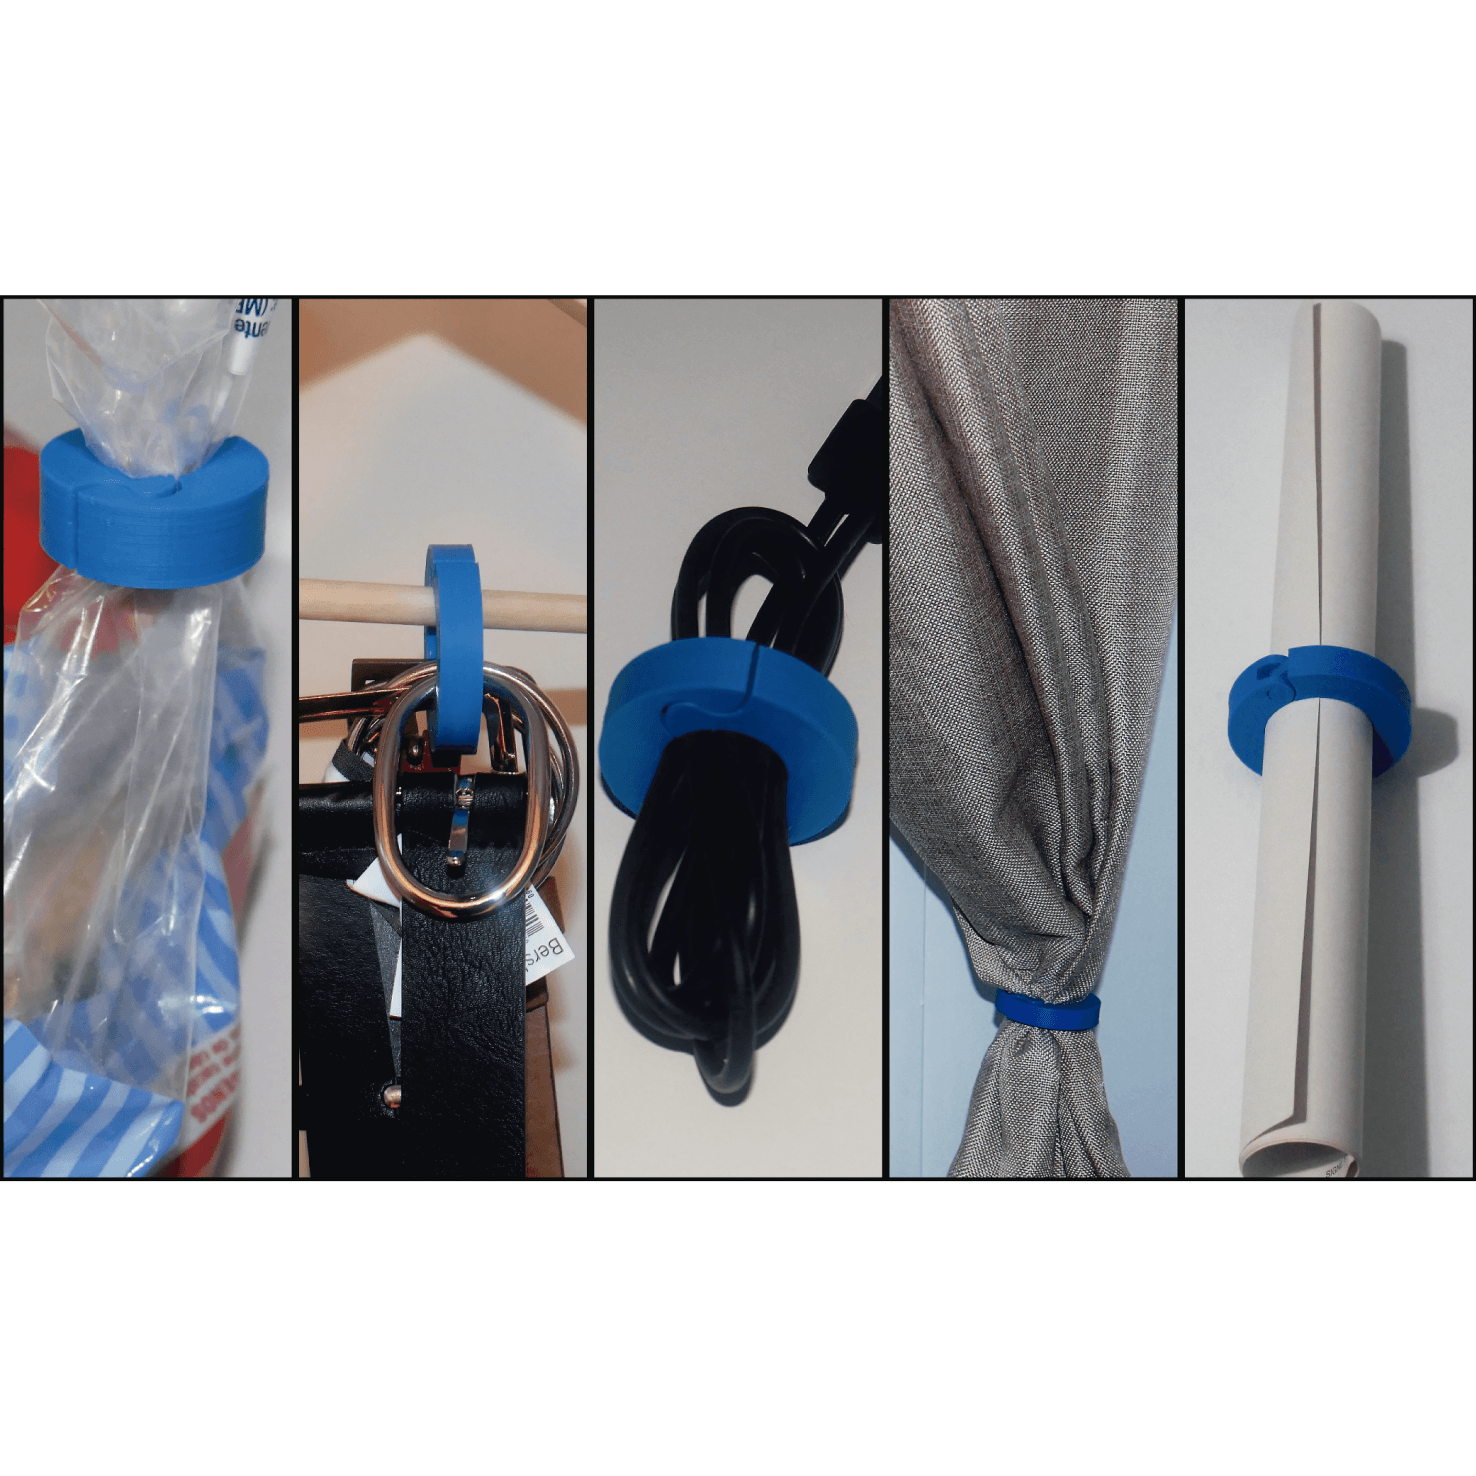 Sin título-2.png Download STL file Multi-purpose round gripper • 3D printing design, 3DKSTRO